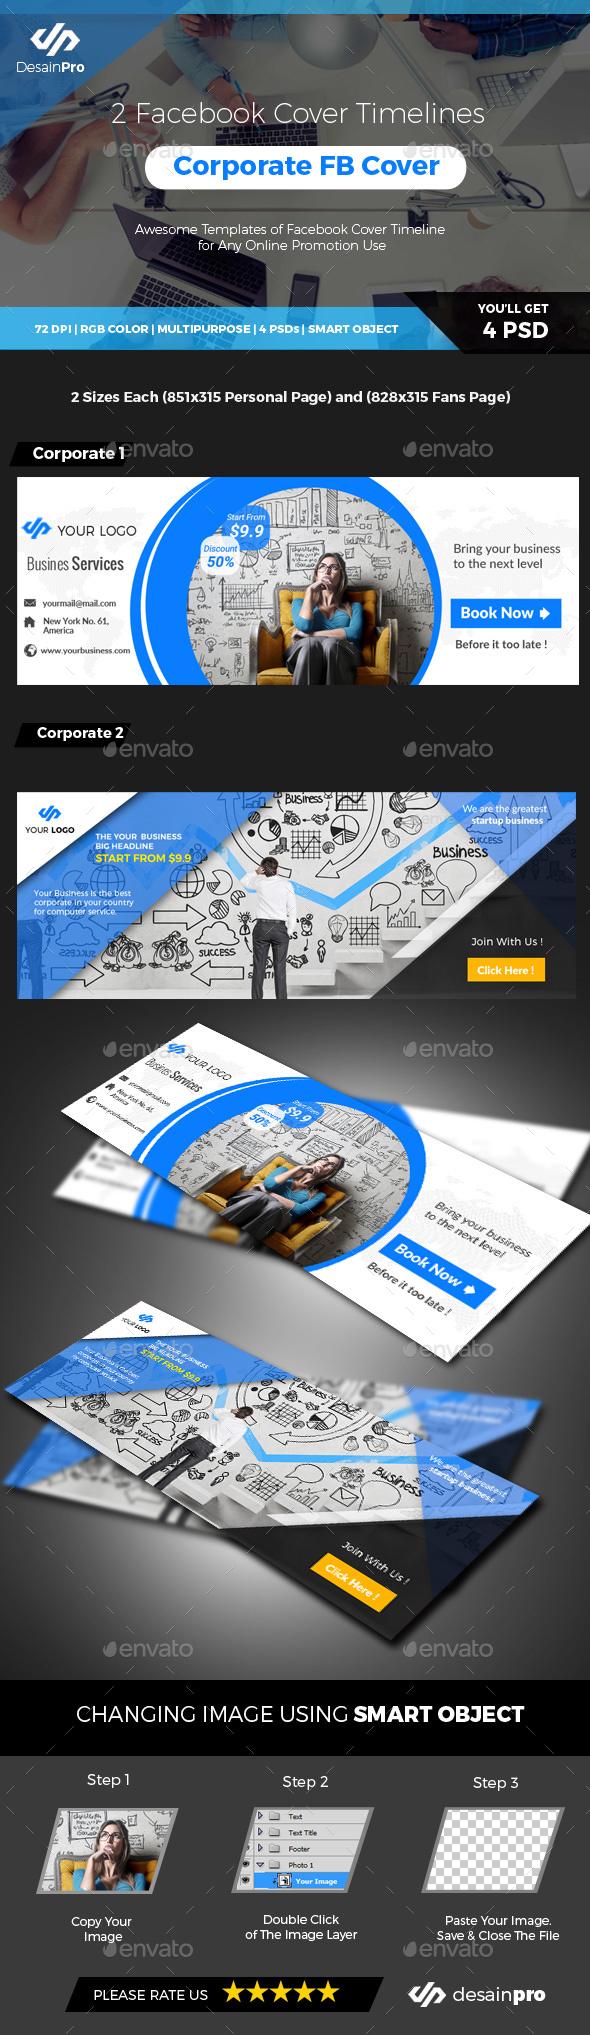 Corporate Facebook Cover Timeline - Facebook Timeline Covers Social Media